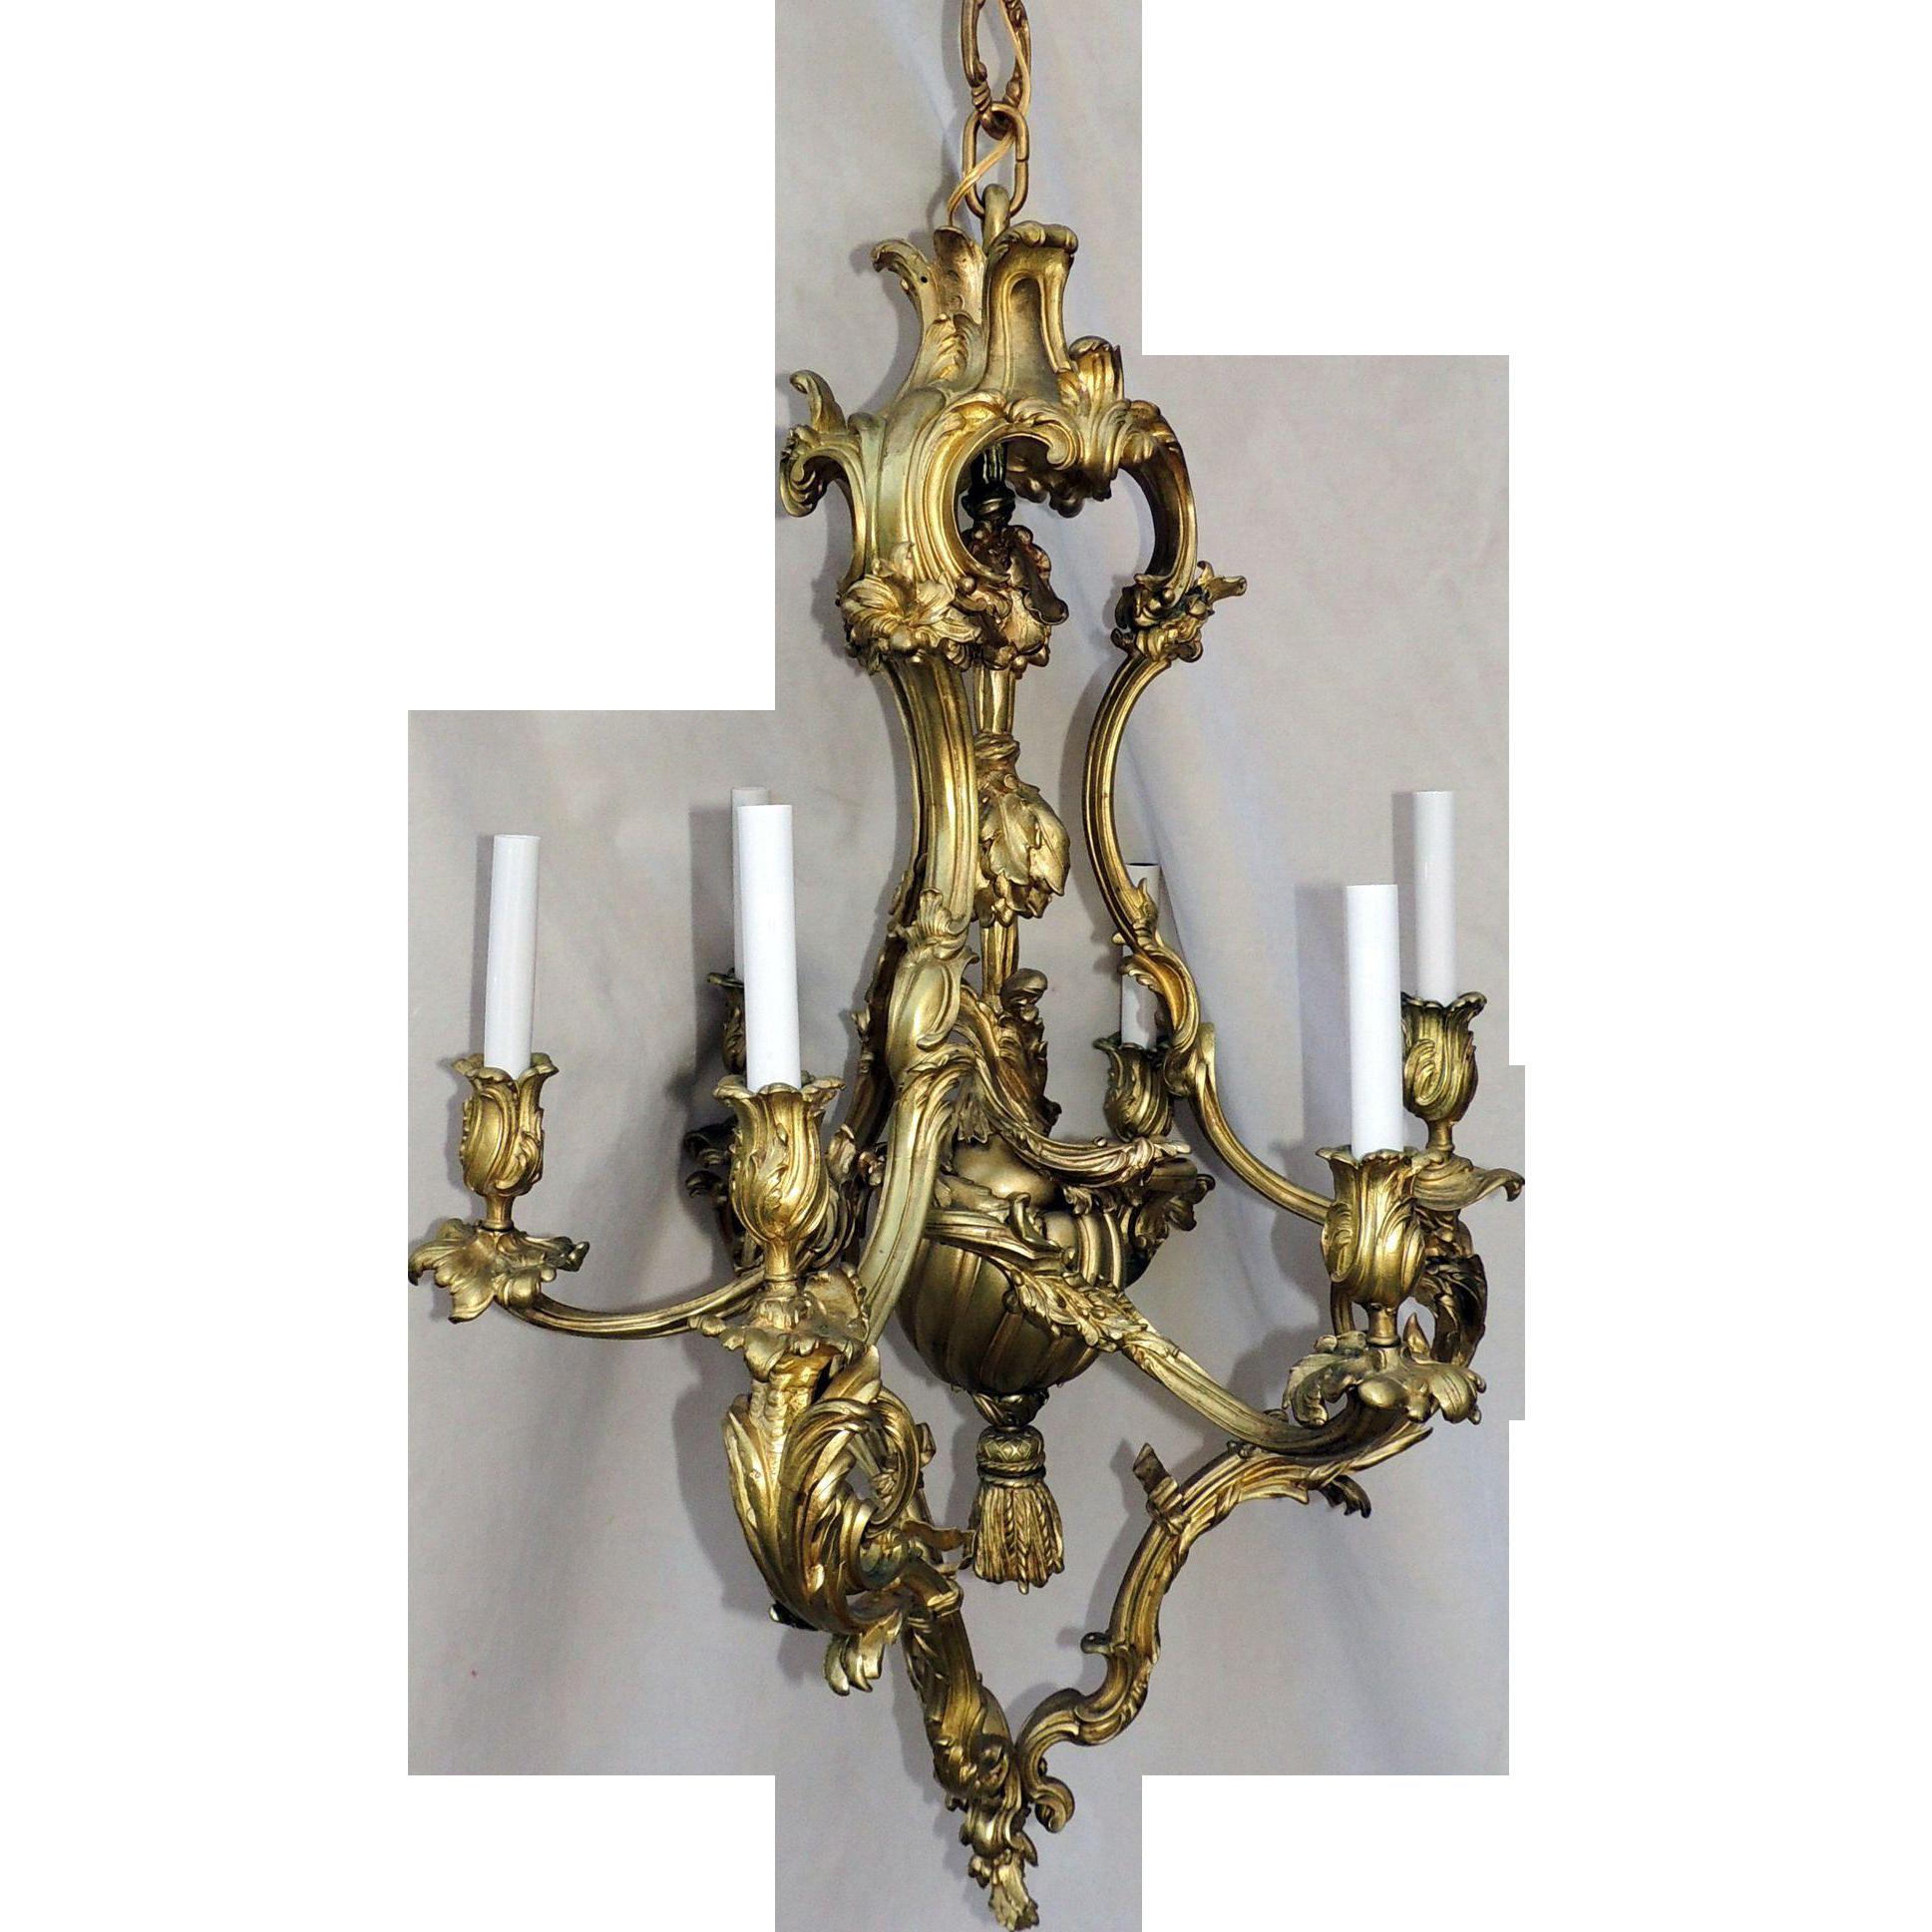 French rococo dor bronze six light elegant chandelier tassel french rococo dor bronze six light elegant chandelier tassel fixture antique elements ruby lane mozeypictures Gallery